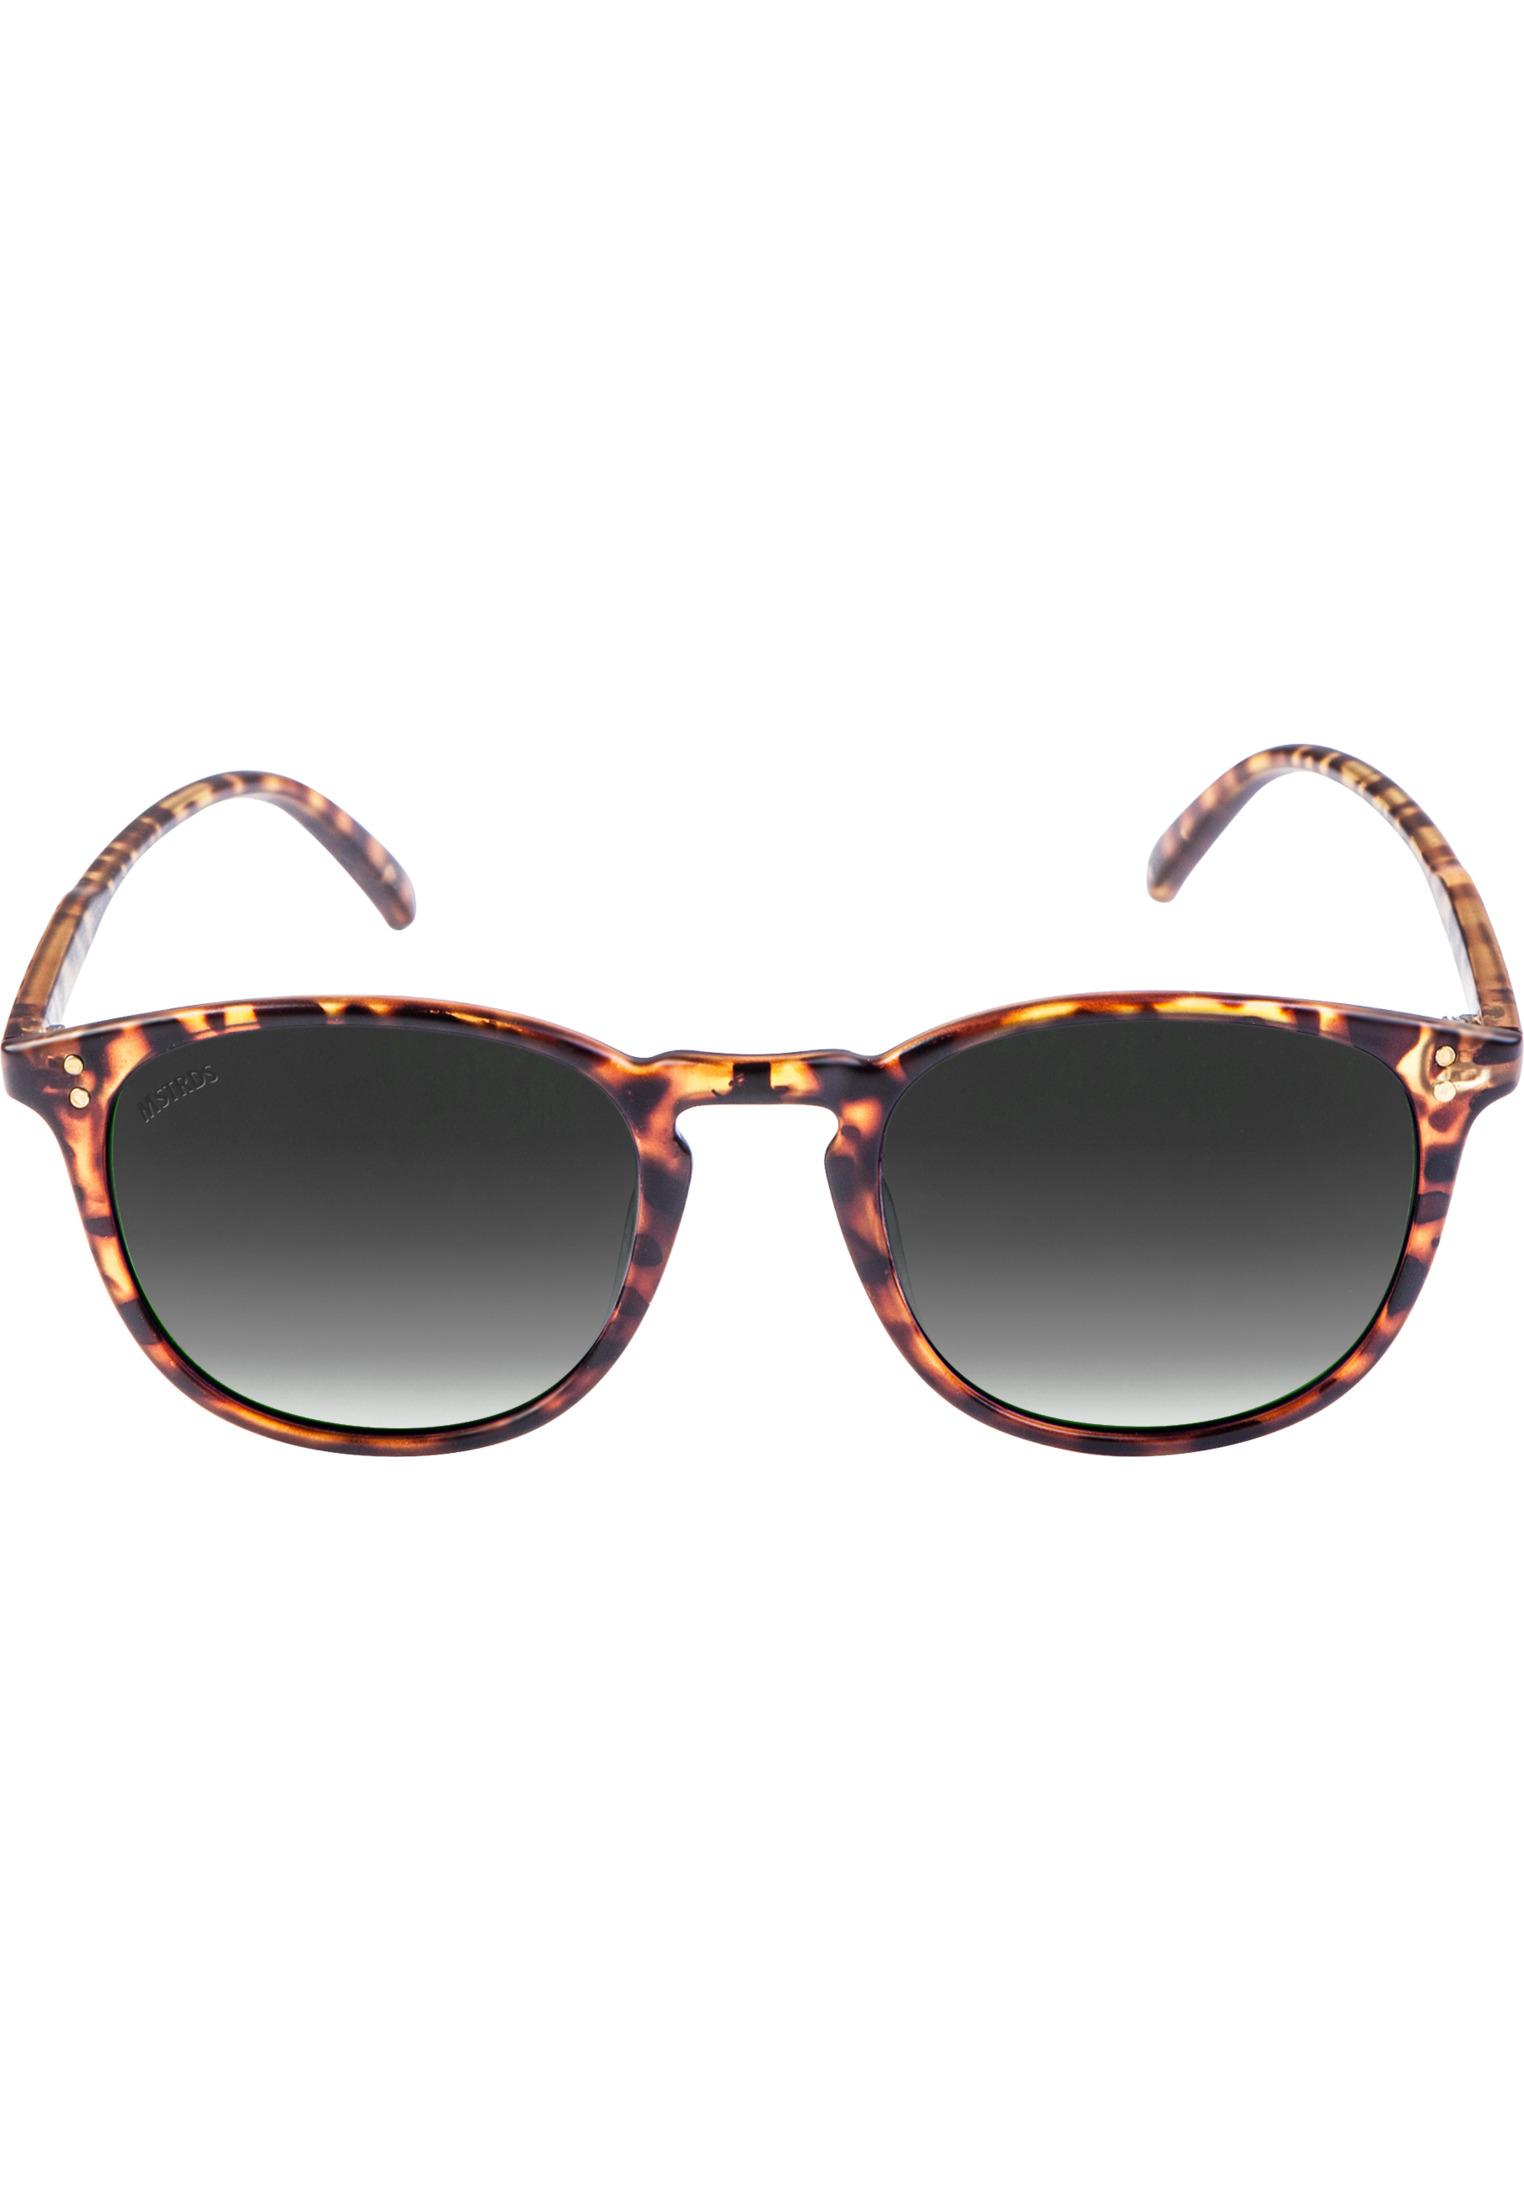 Master Dis Sunglasses Arthur Youth havanna/grey - One Size